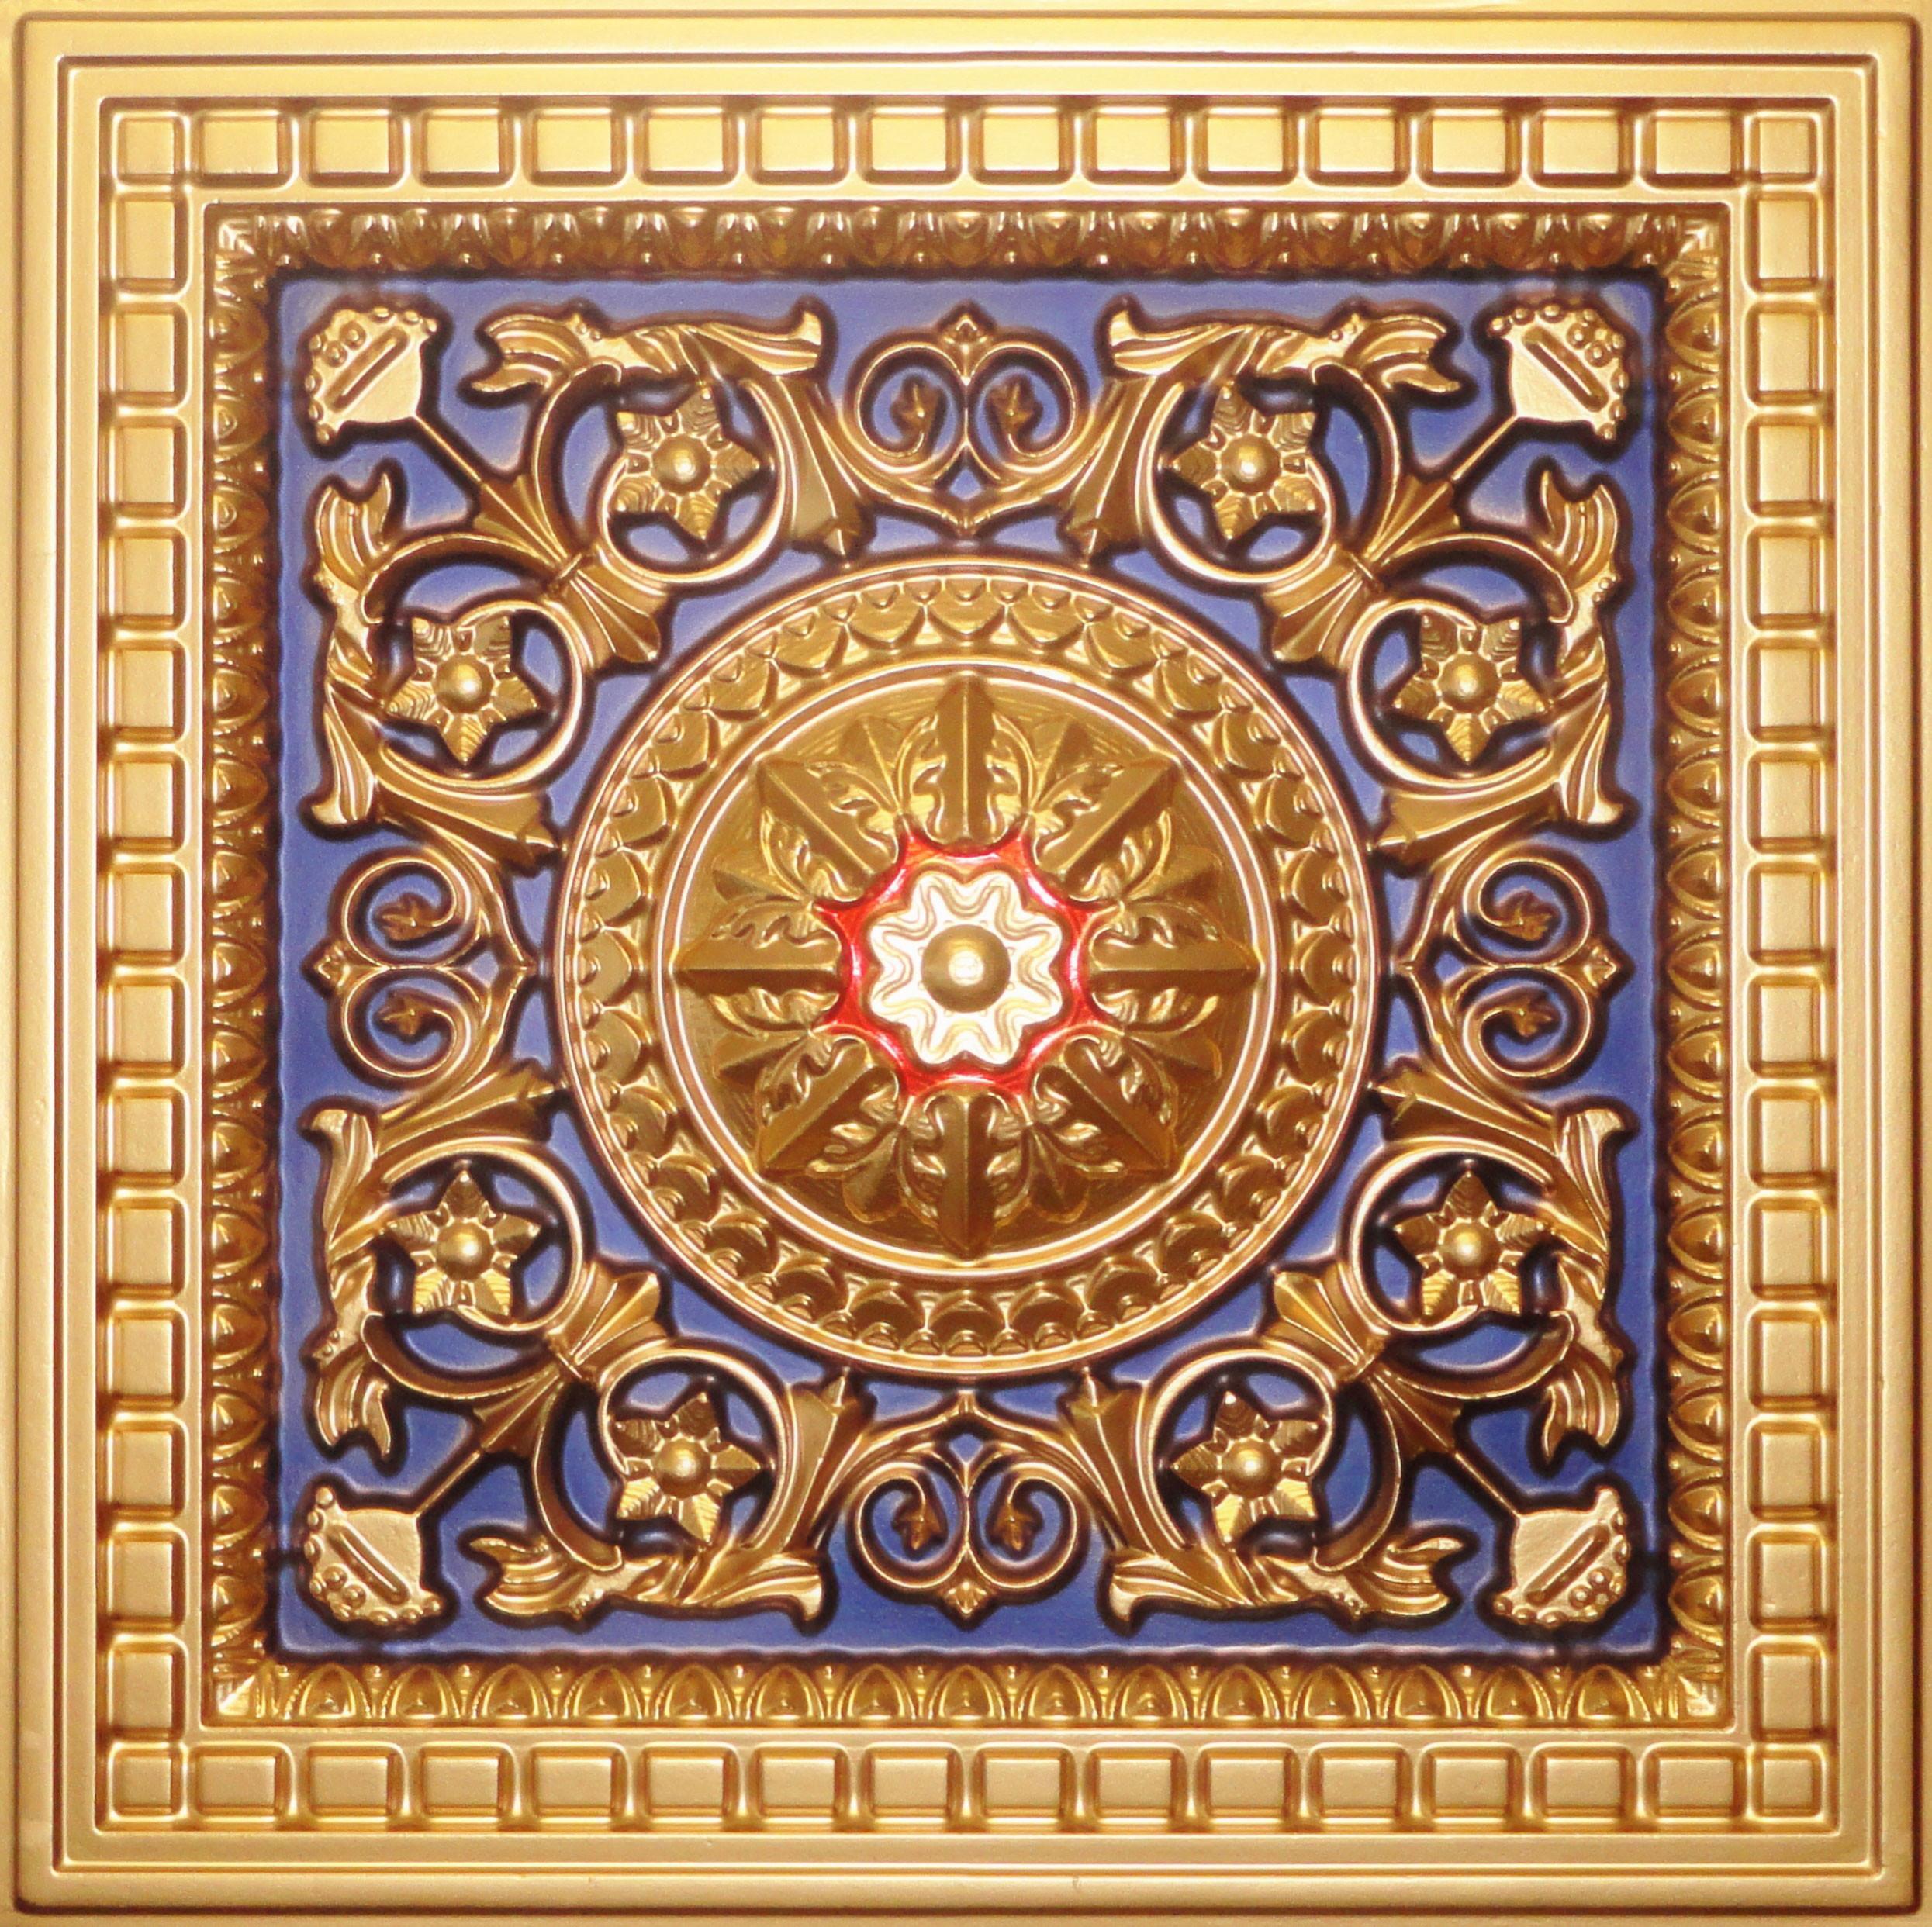 24X24 Ceiling Tiles